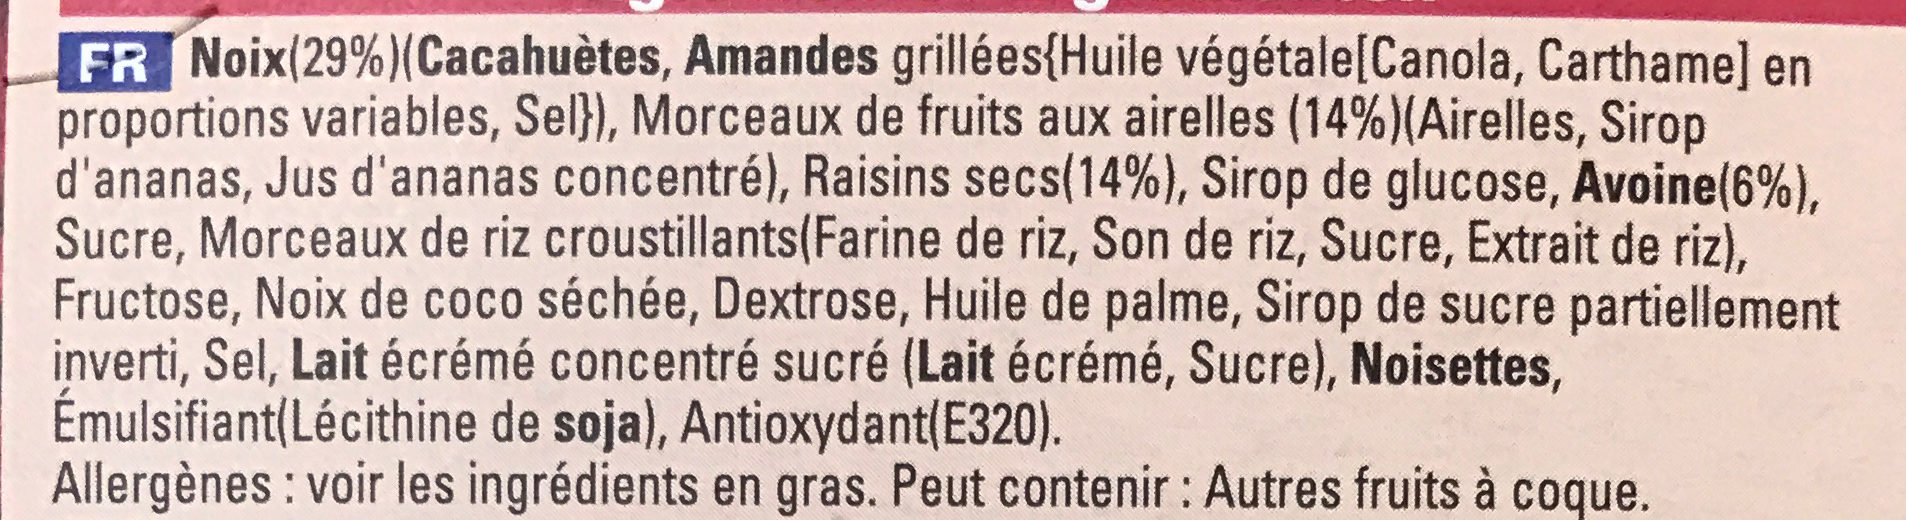 Extra Barre généreuse Amandes grillées et Cranberries - Ingrediënten